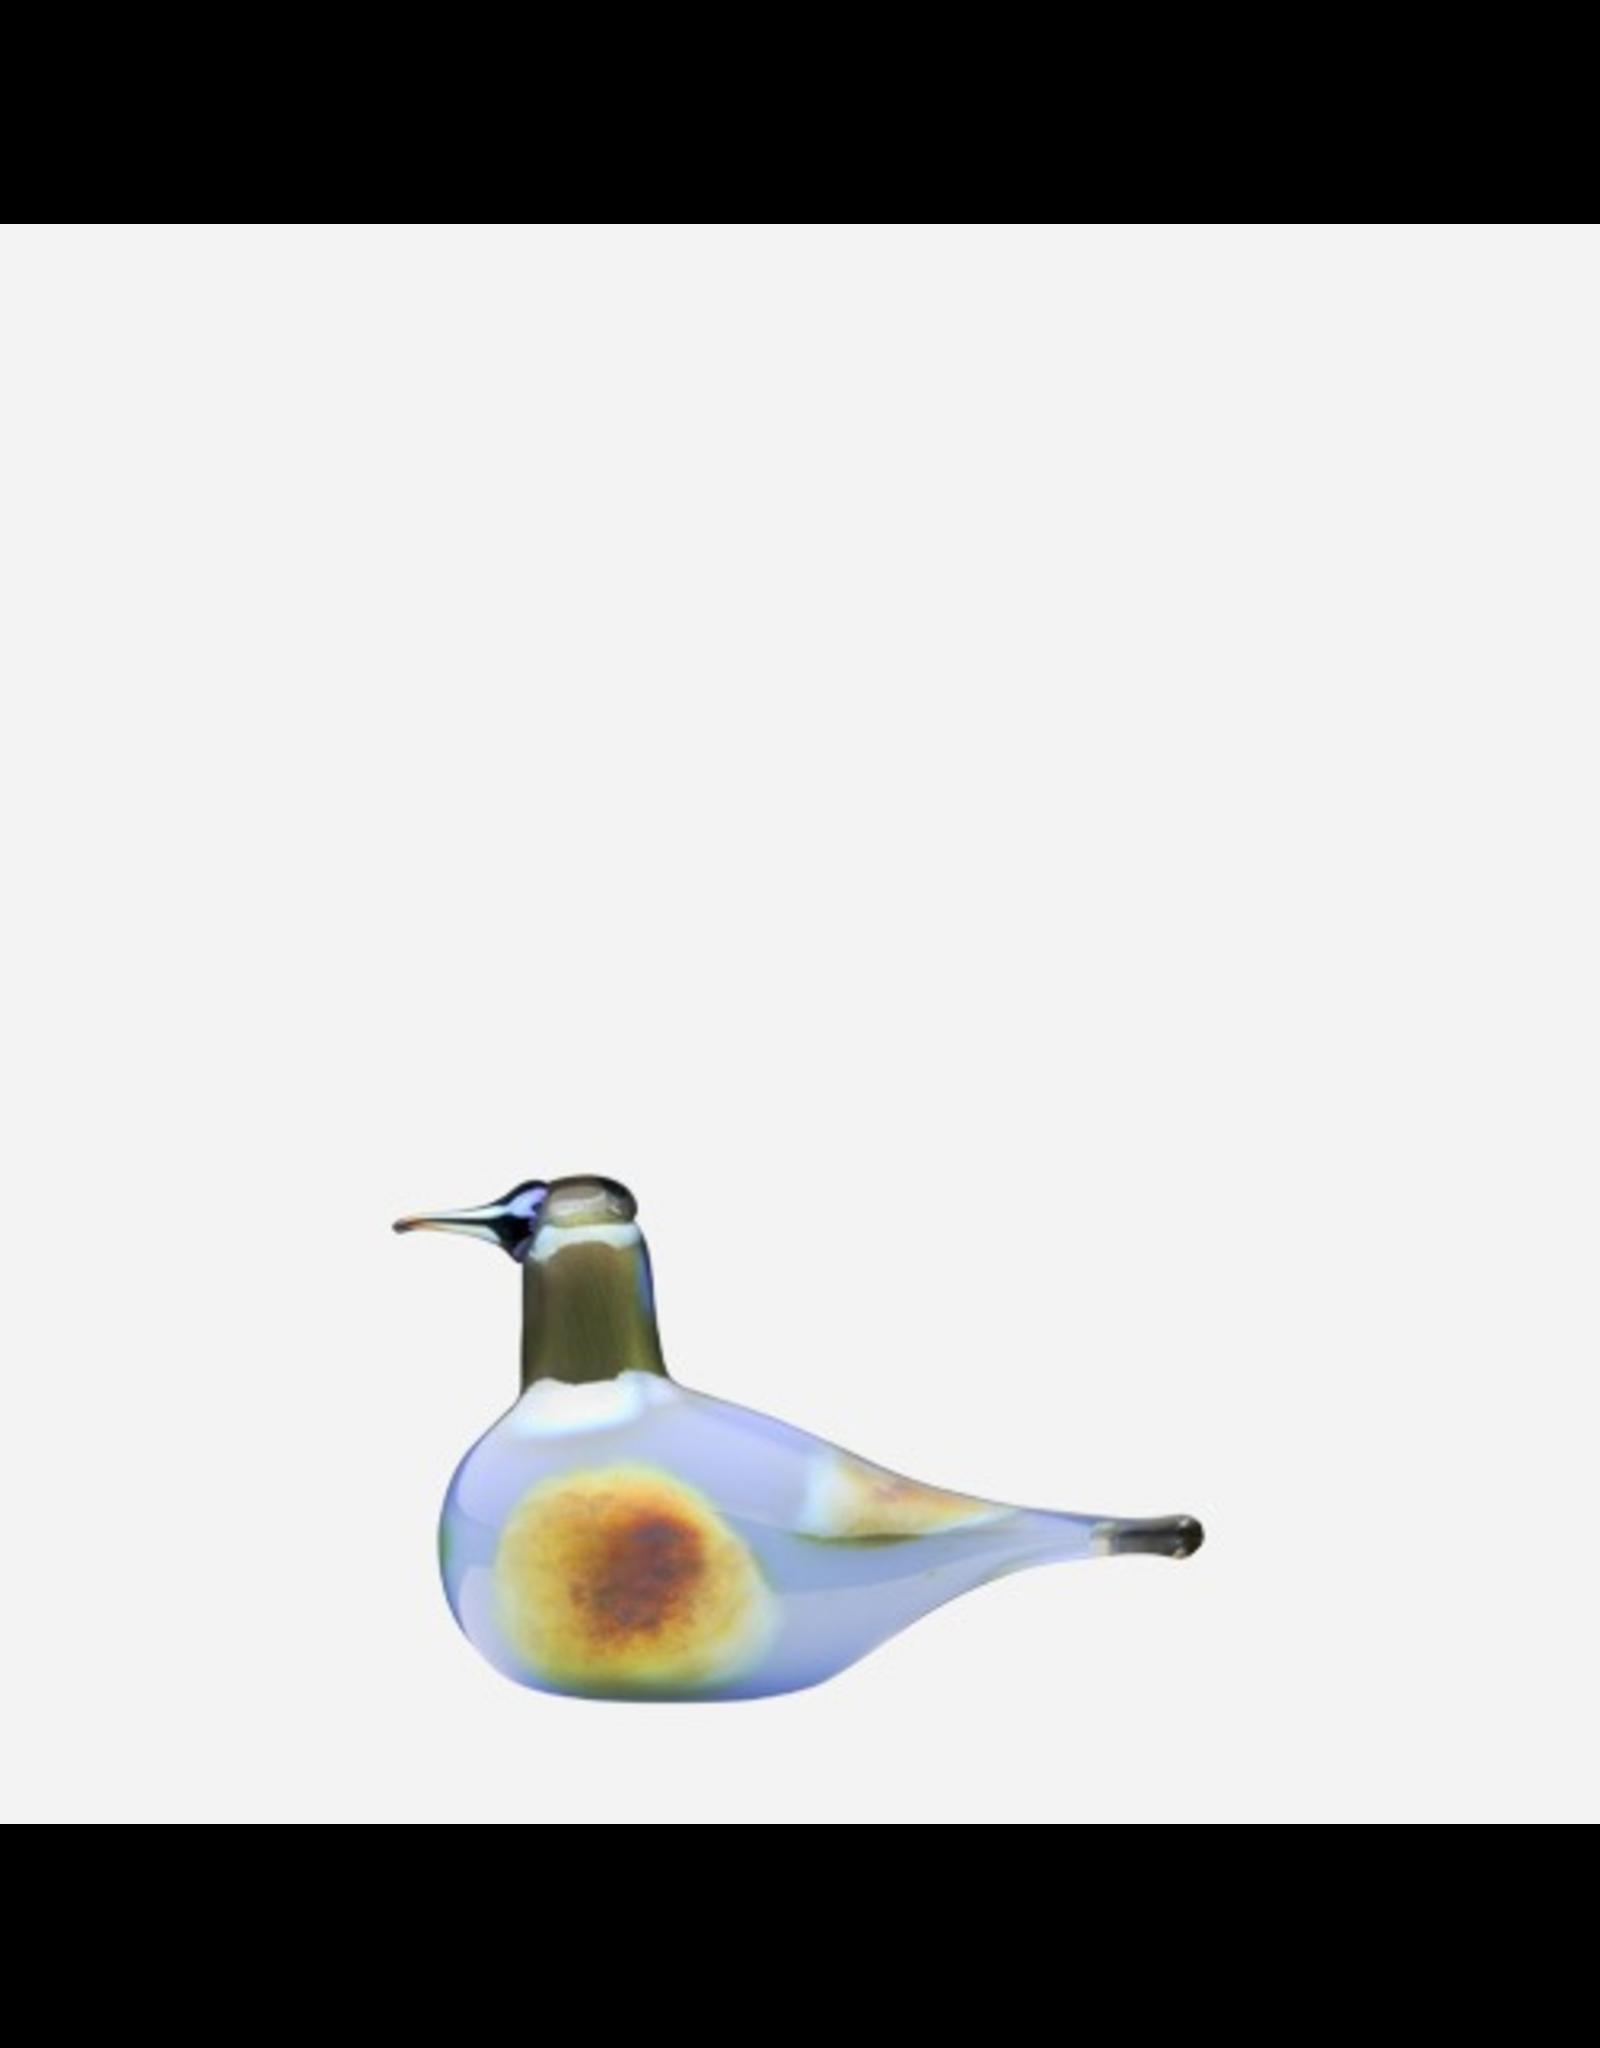 BIRDS BY TOIKKA, SKY CURLEW